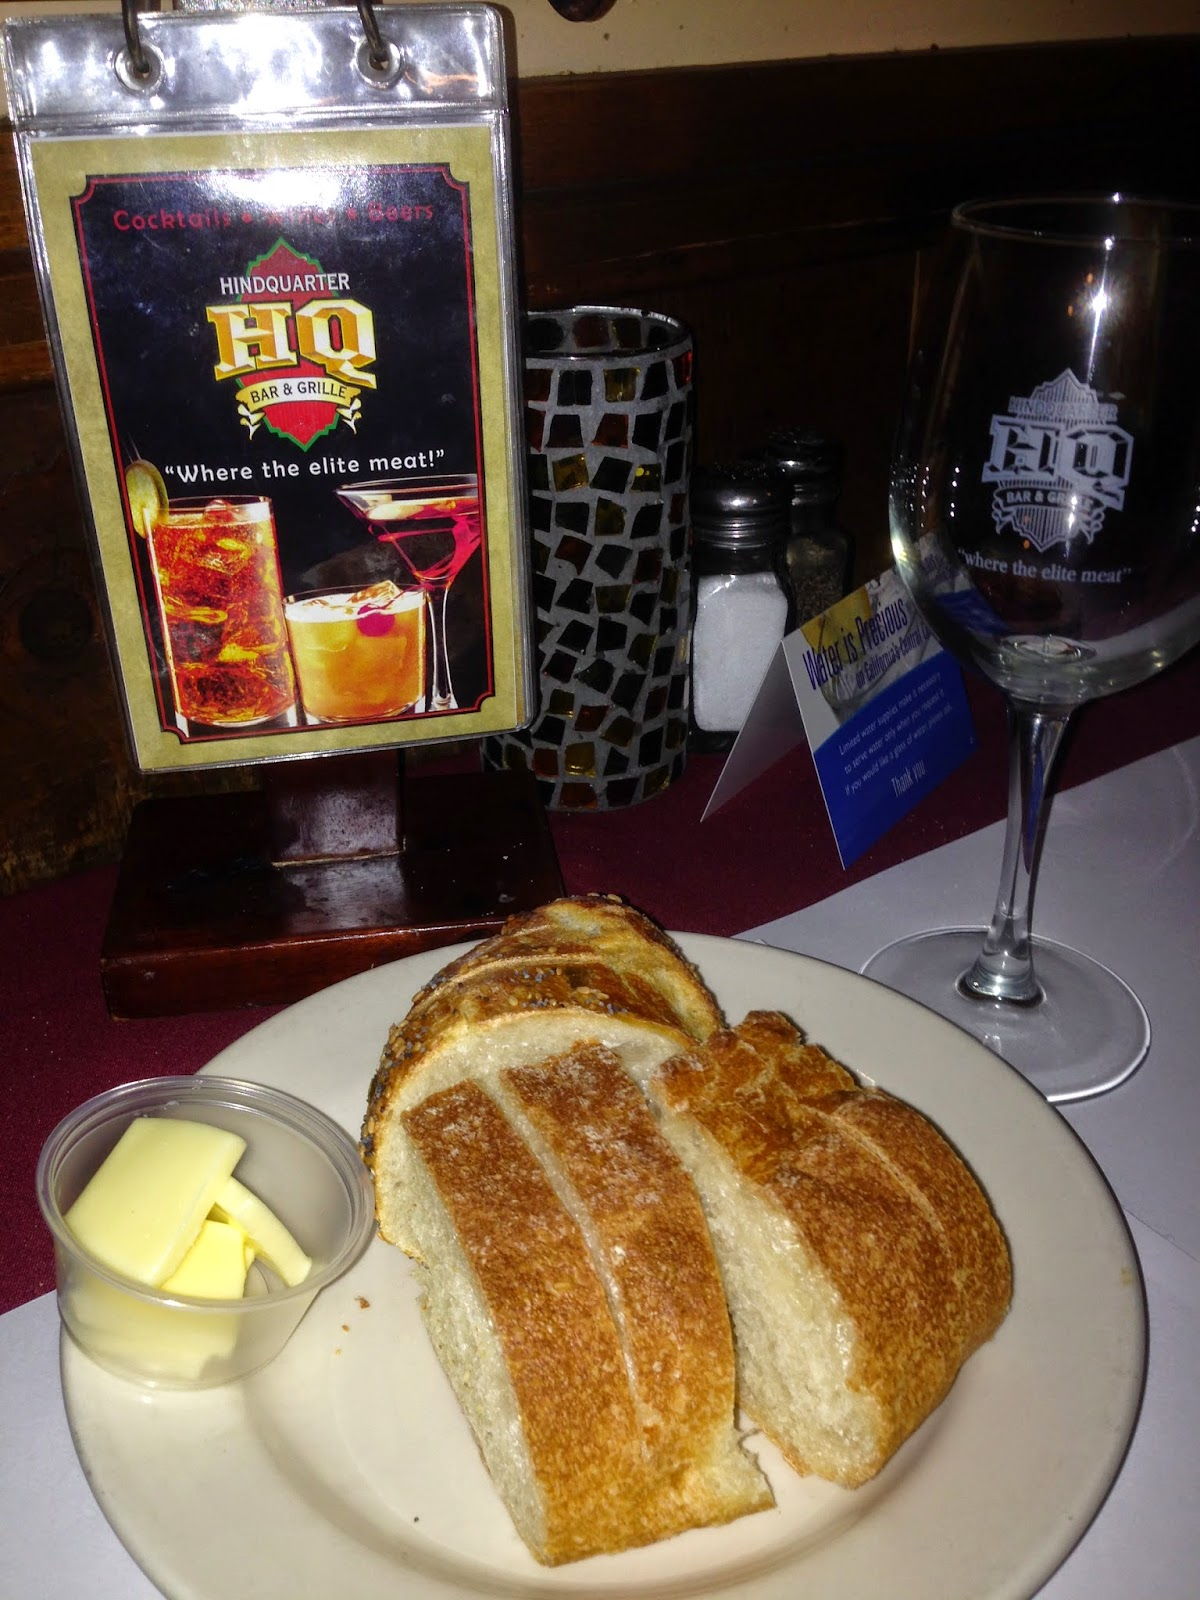 The Santa Cruz Food Blog: Hindquarter Bar & Grille